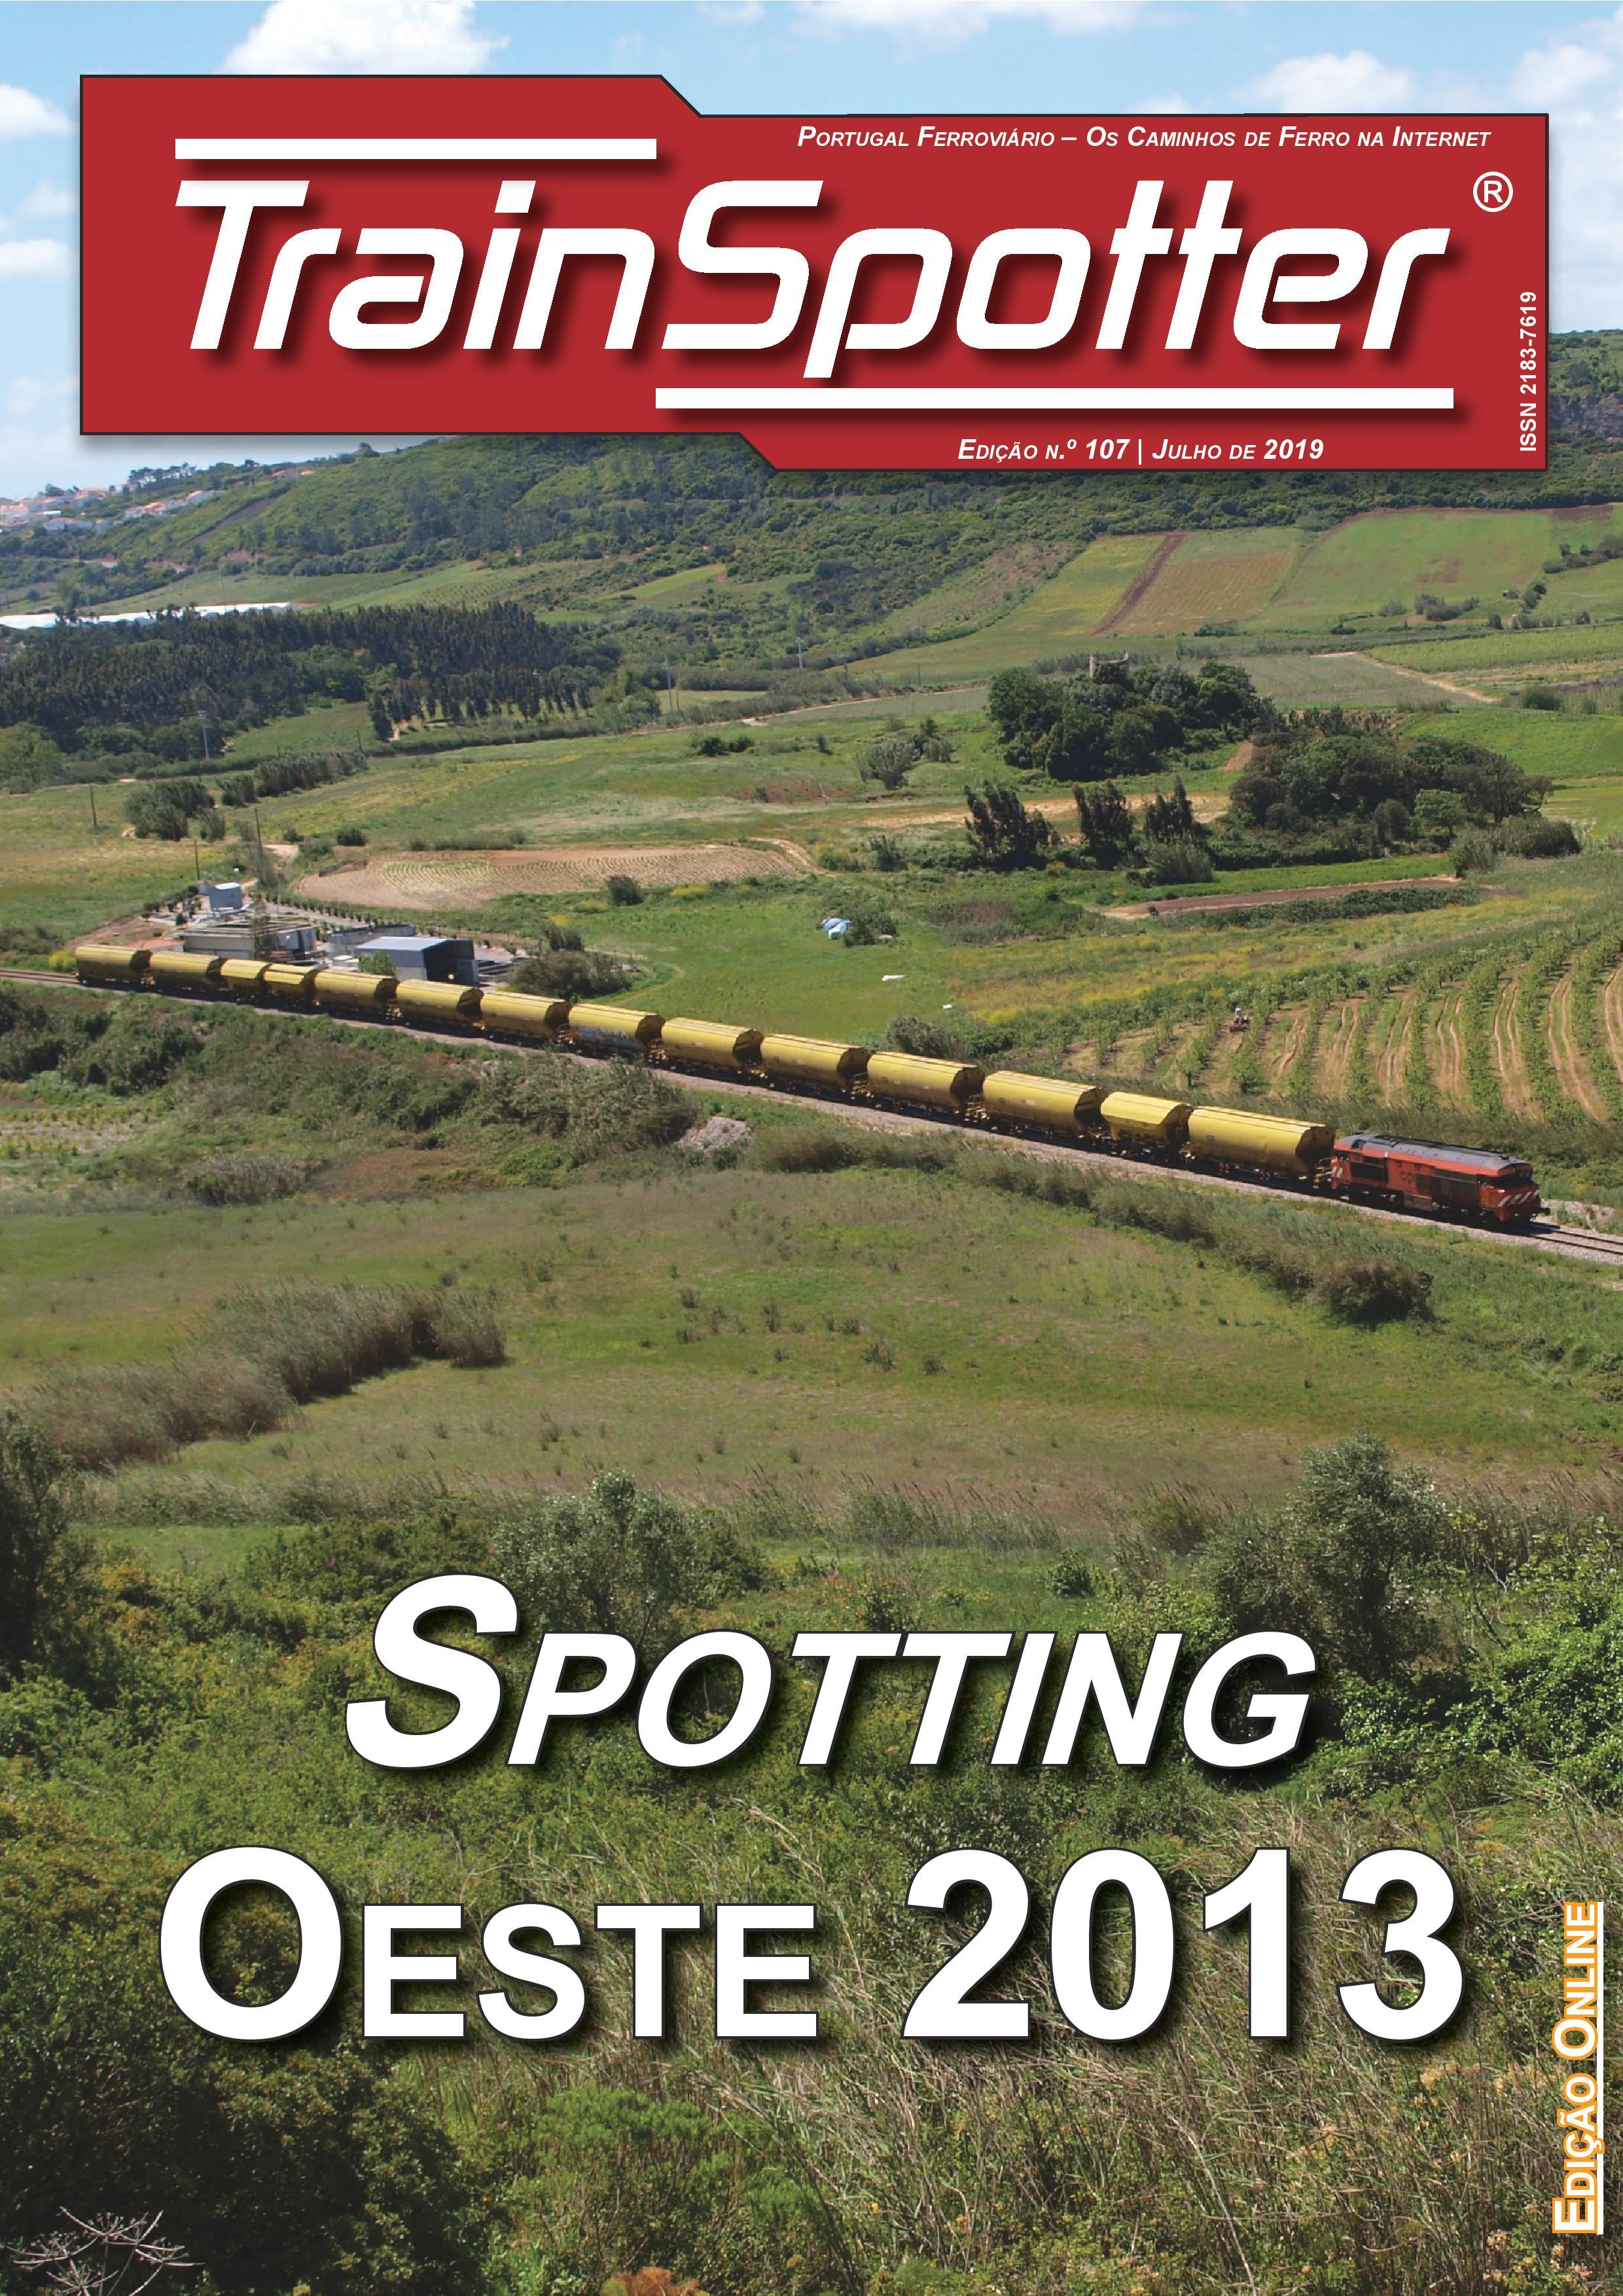 Trainspotter nº 107 – Julho de 2019